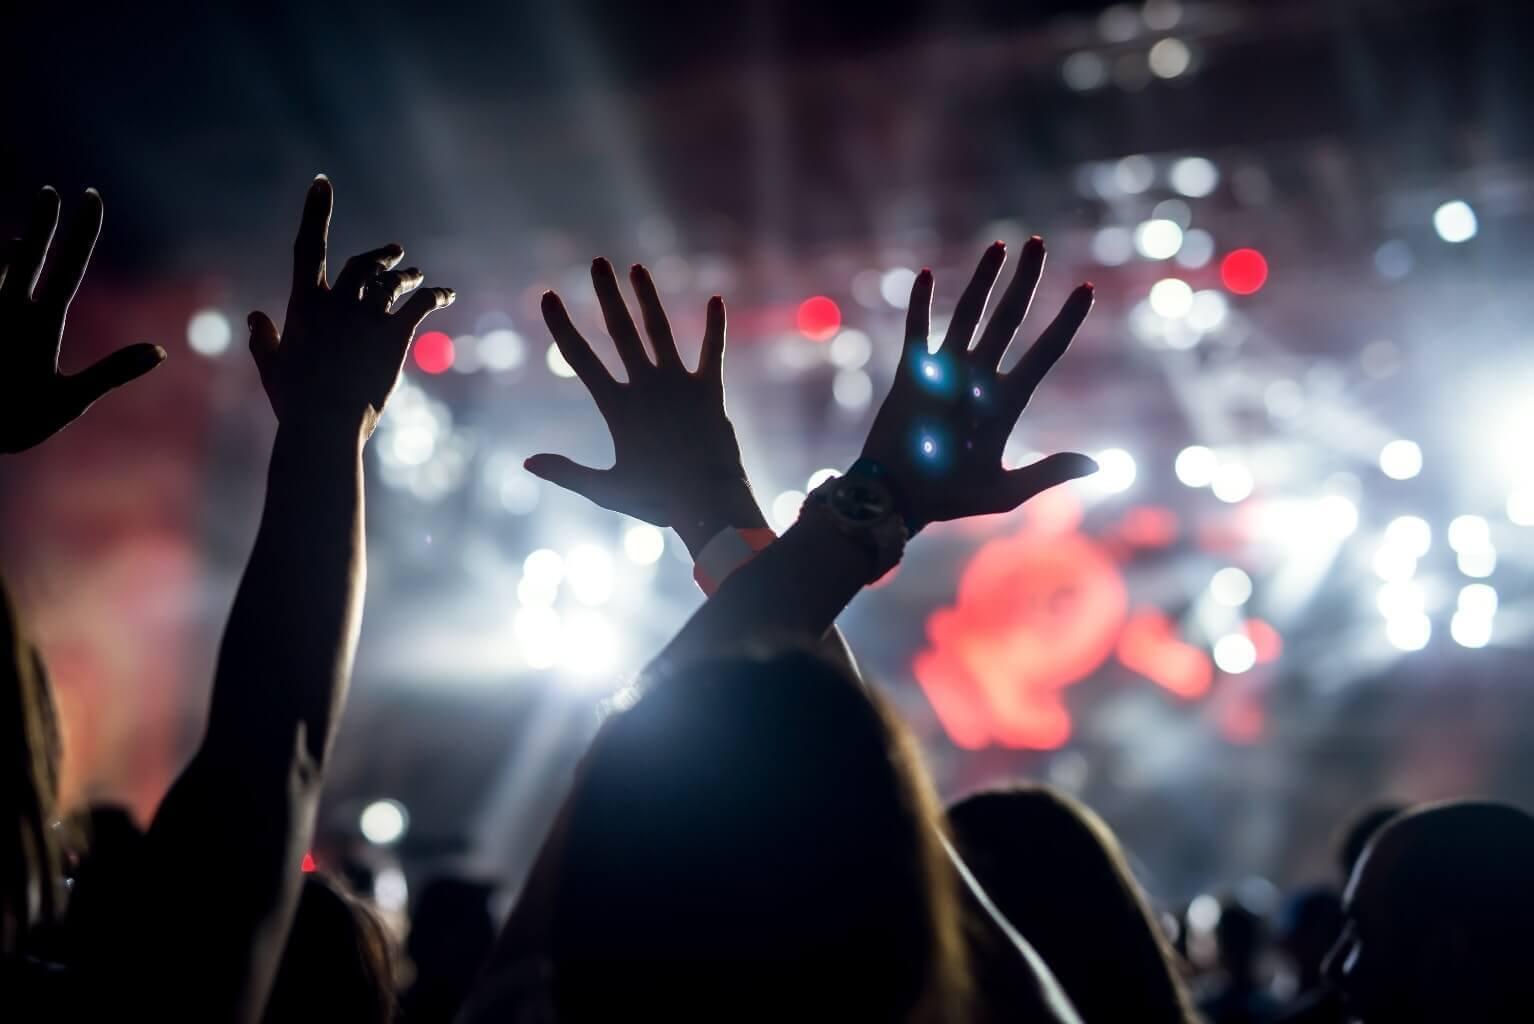 Soirée, festival, concert à Ottawa, Canada